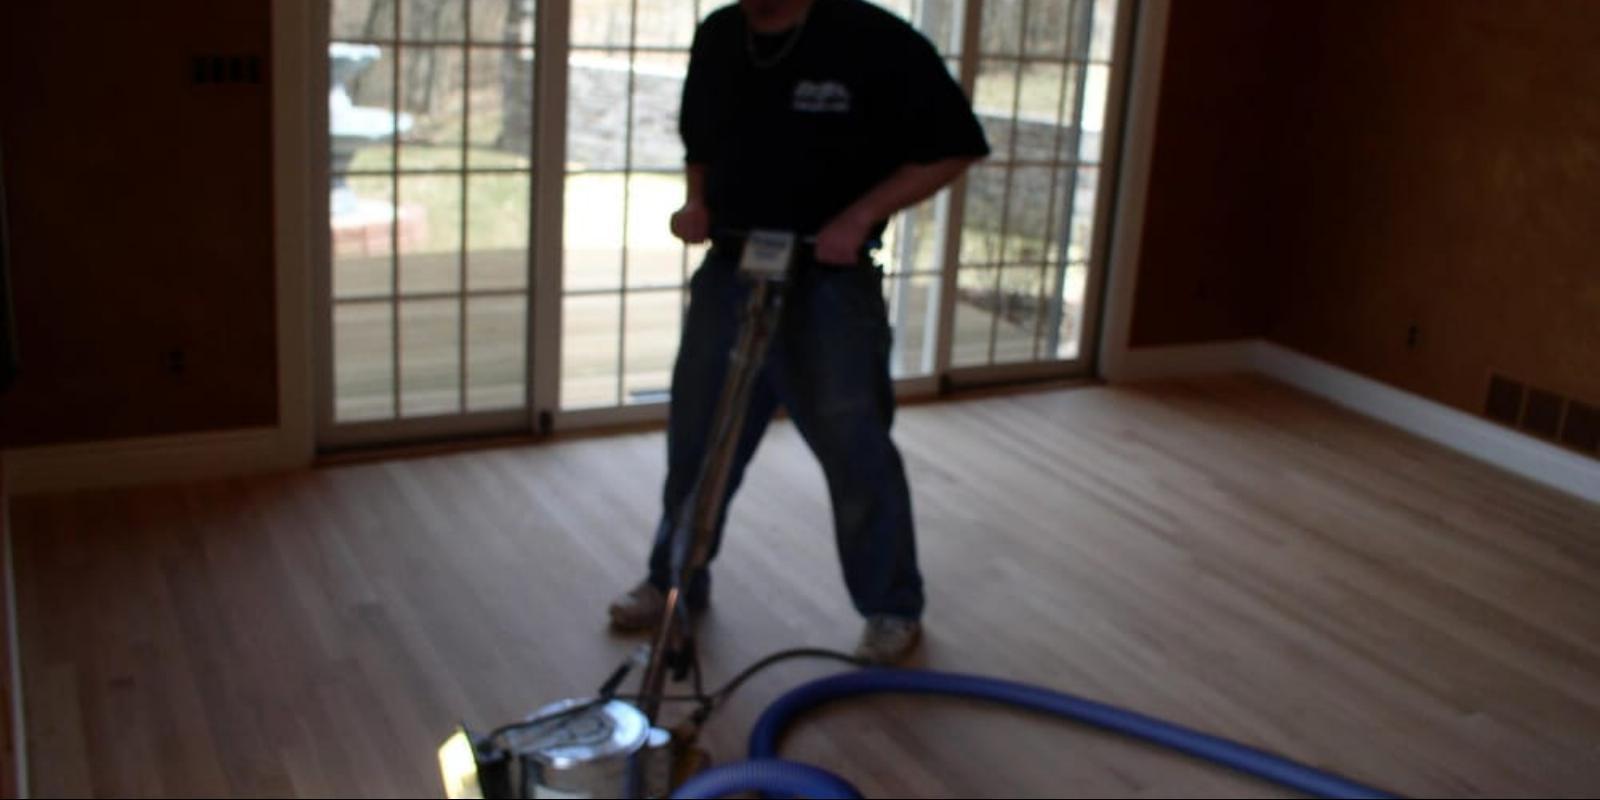 hardwood floor refinishing overland park ks of blue valley hardwood floors lenexa kansas 913 208 3652 within image